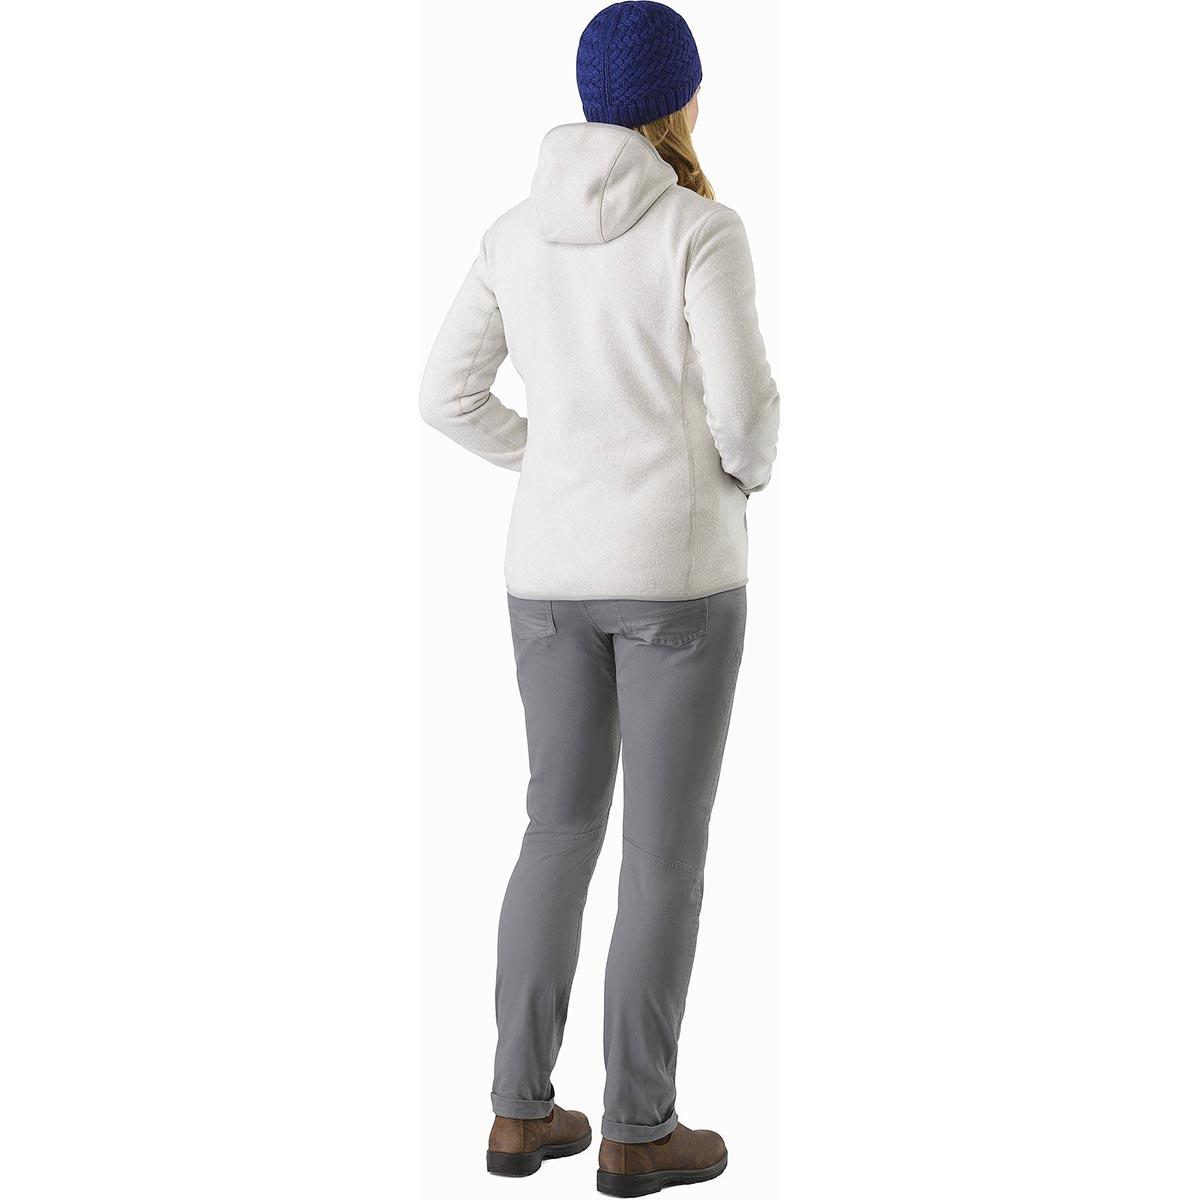 89325b30688 Arc'teryx Covert Hoody, women's, discontinued Fall 2018 colors (free ...